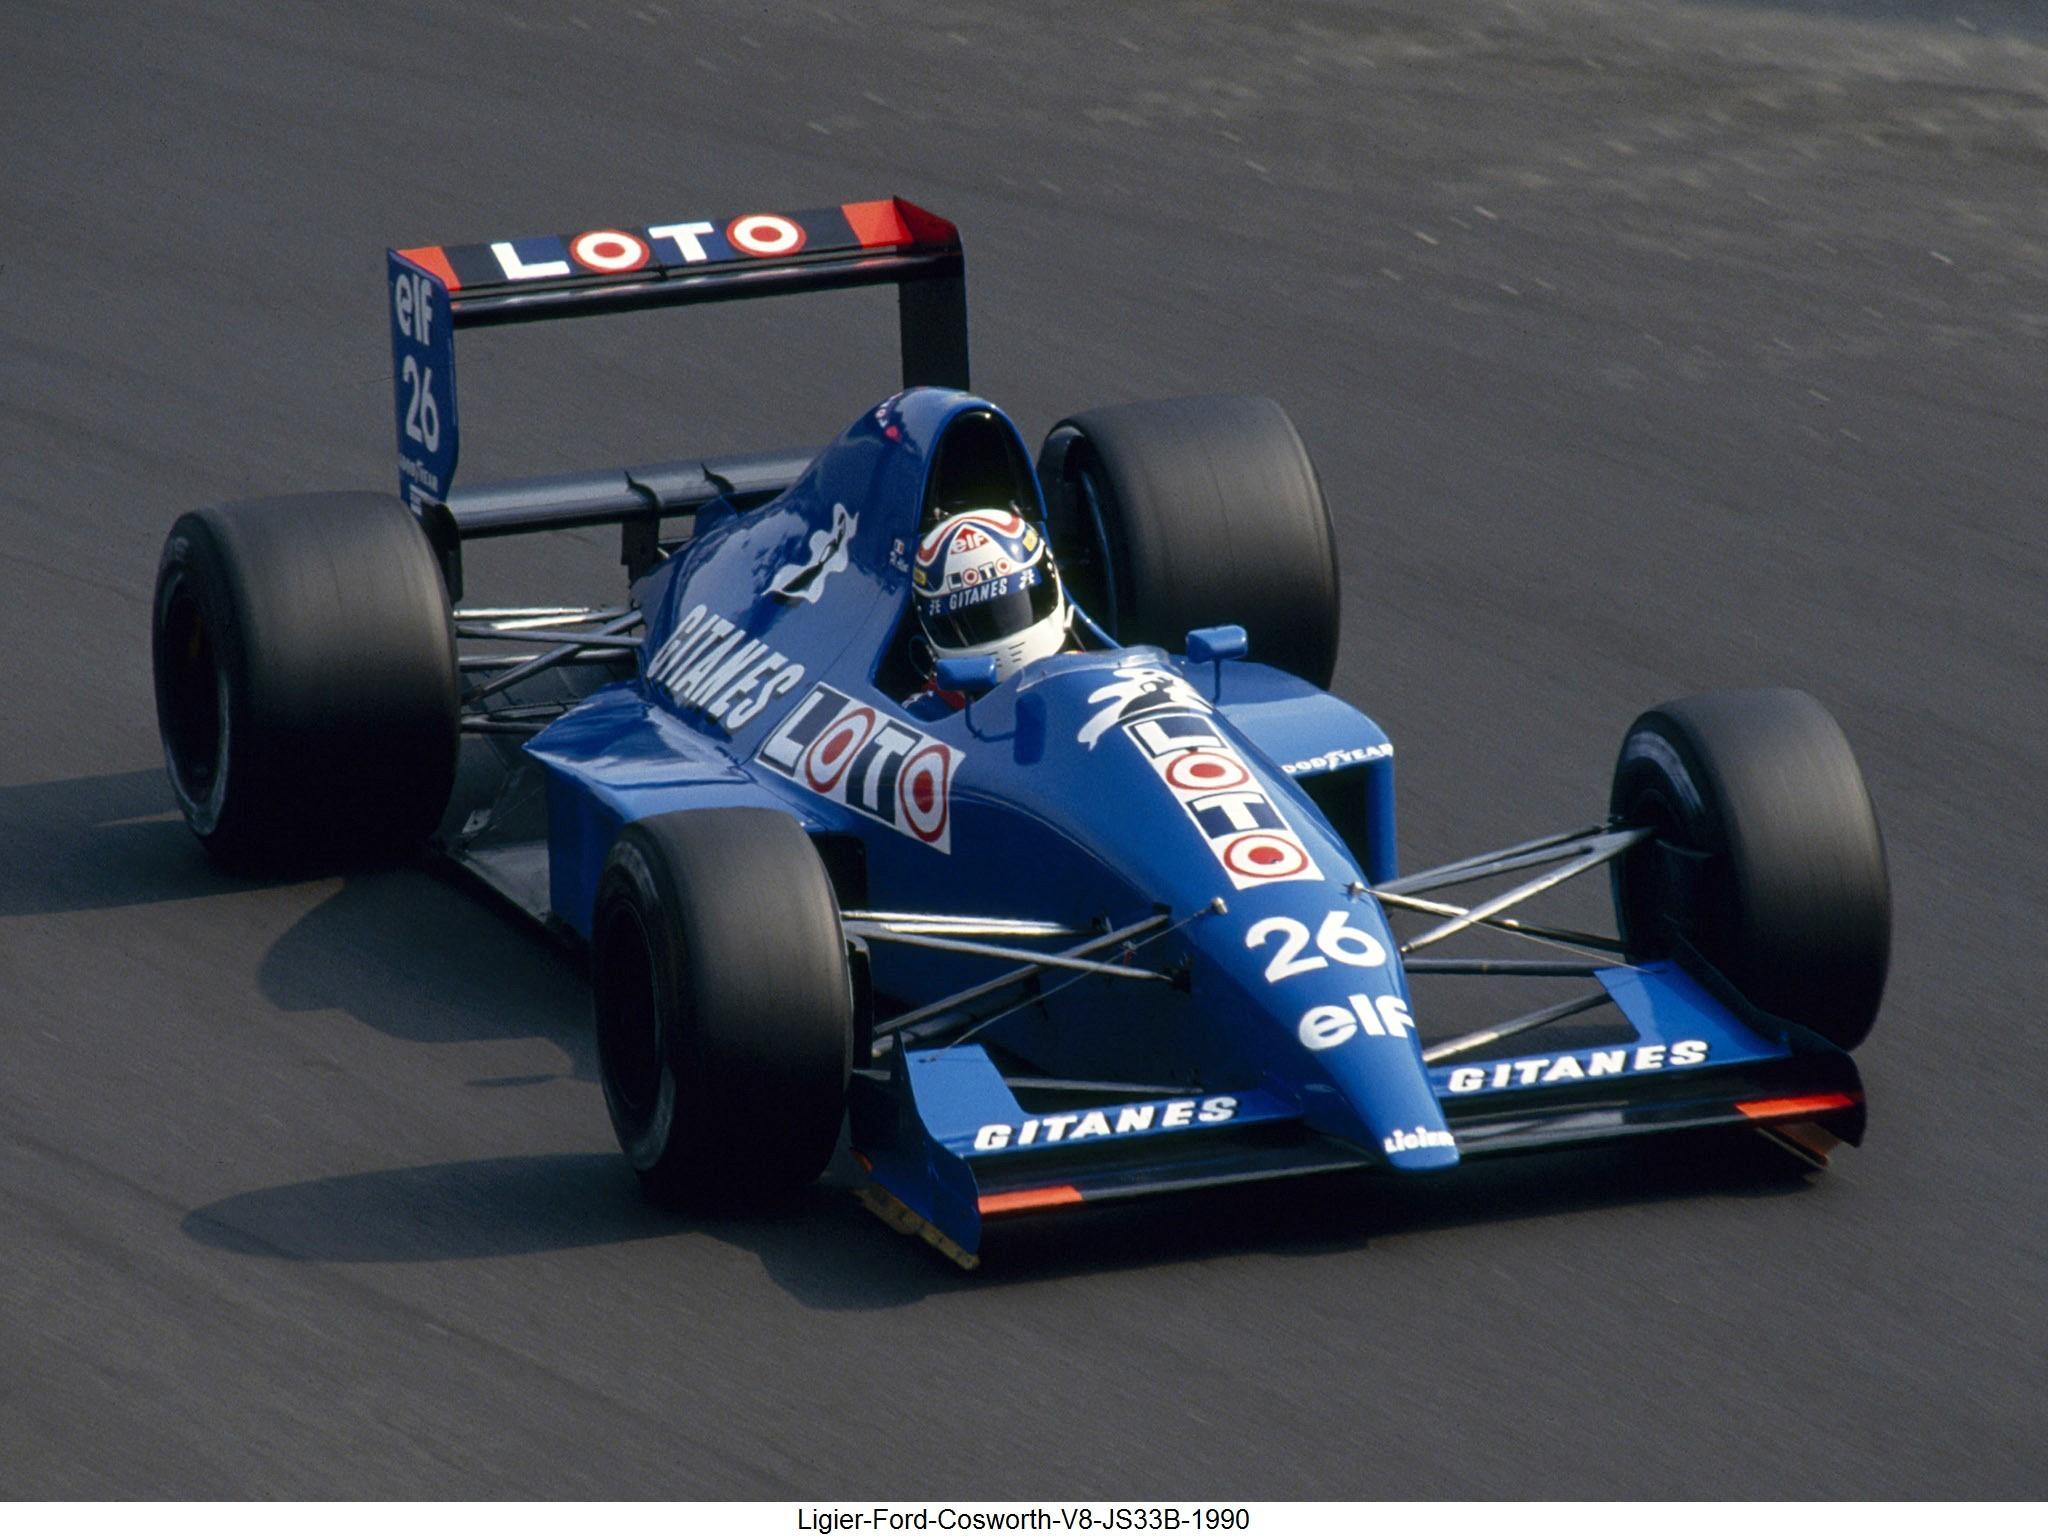 Ligier Ford Cosworth V8 JS33B 1990